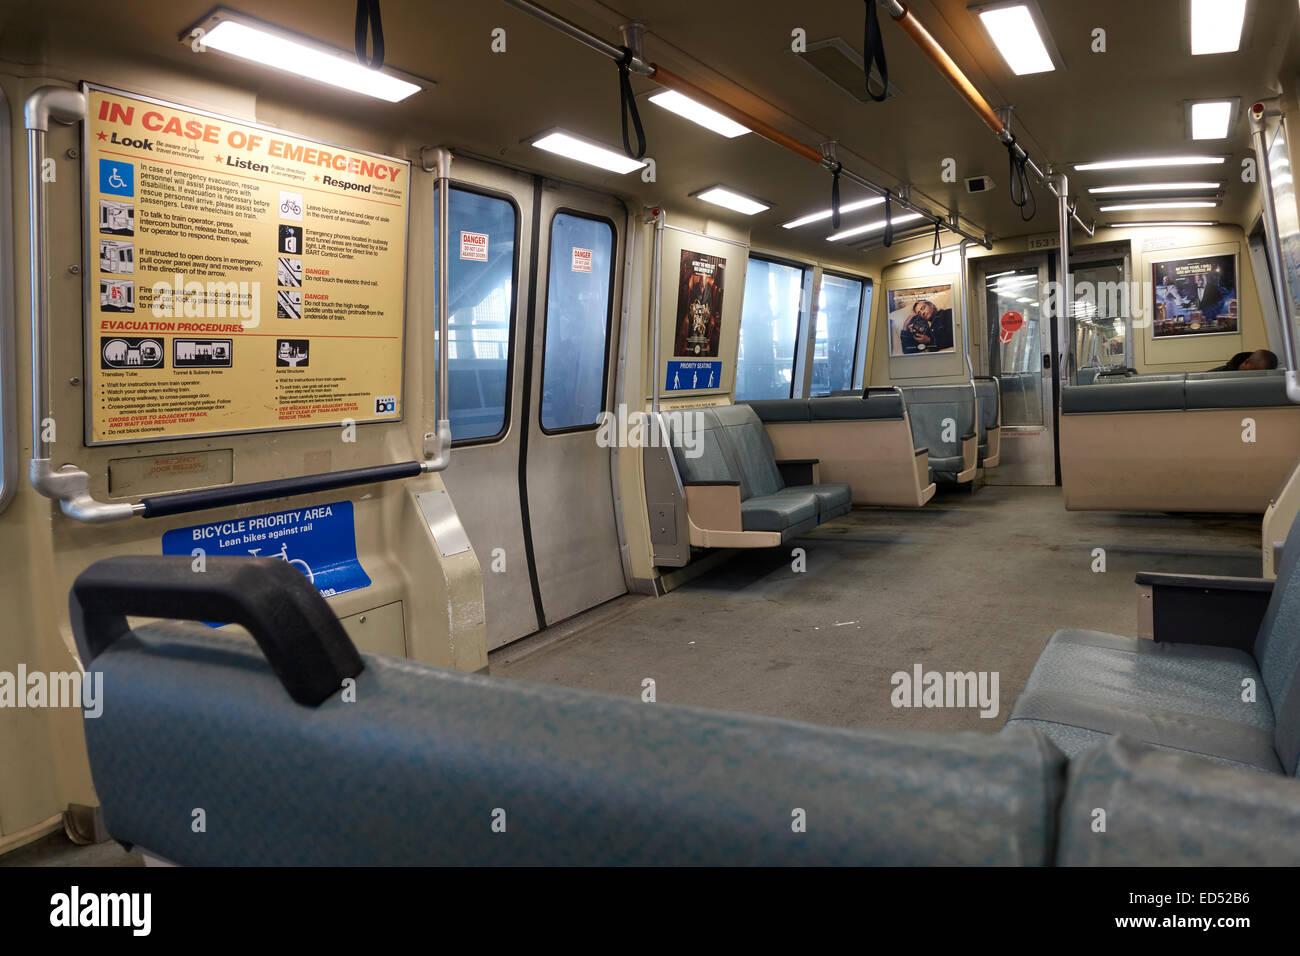 Inside a Bay Area Rapid Transit (BART) train, California, USA - Stock Image